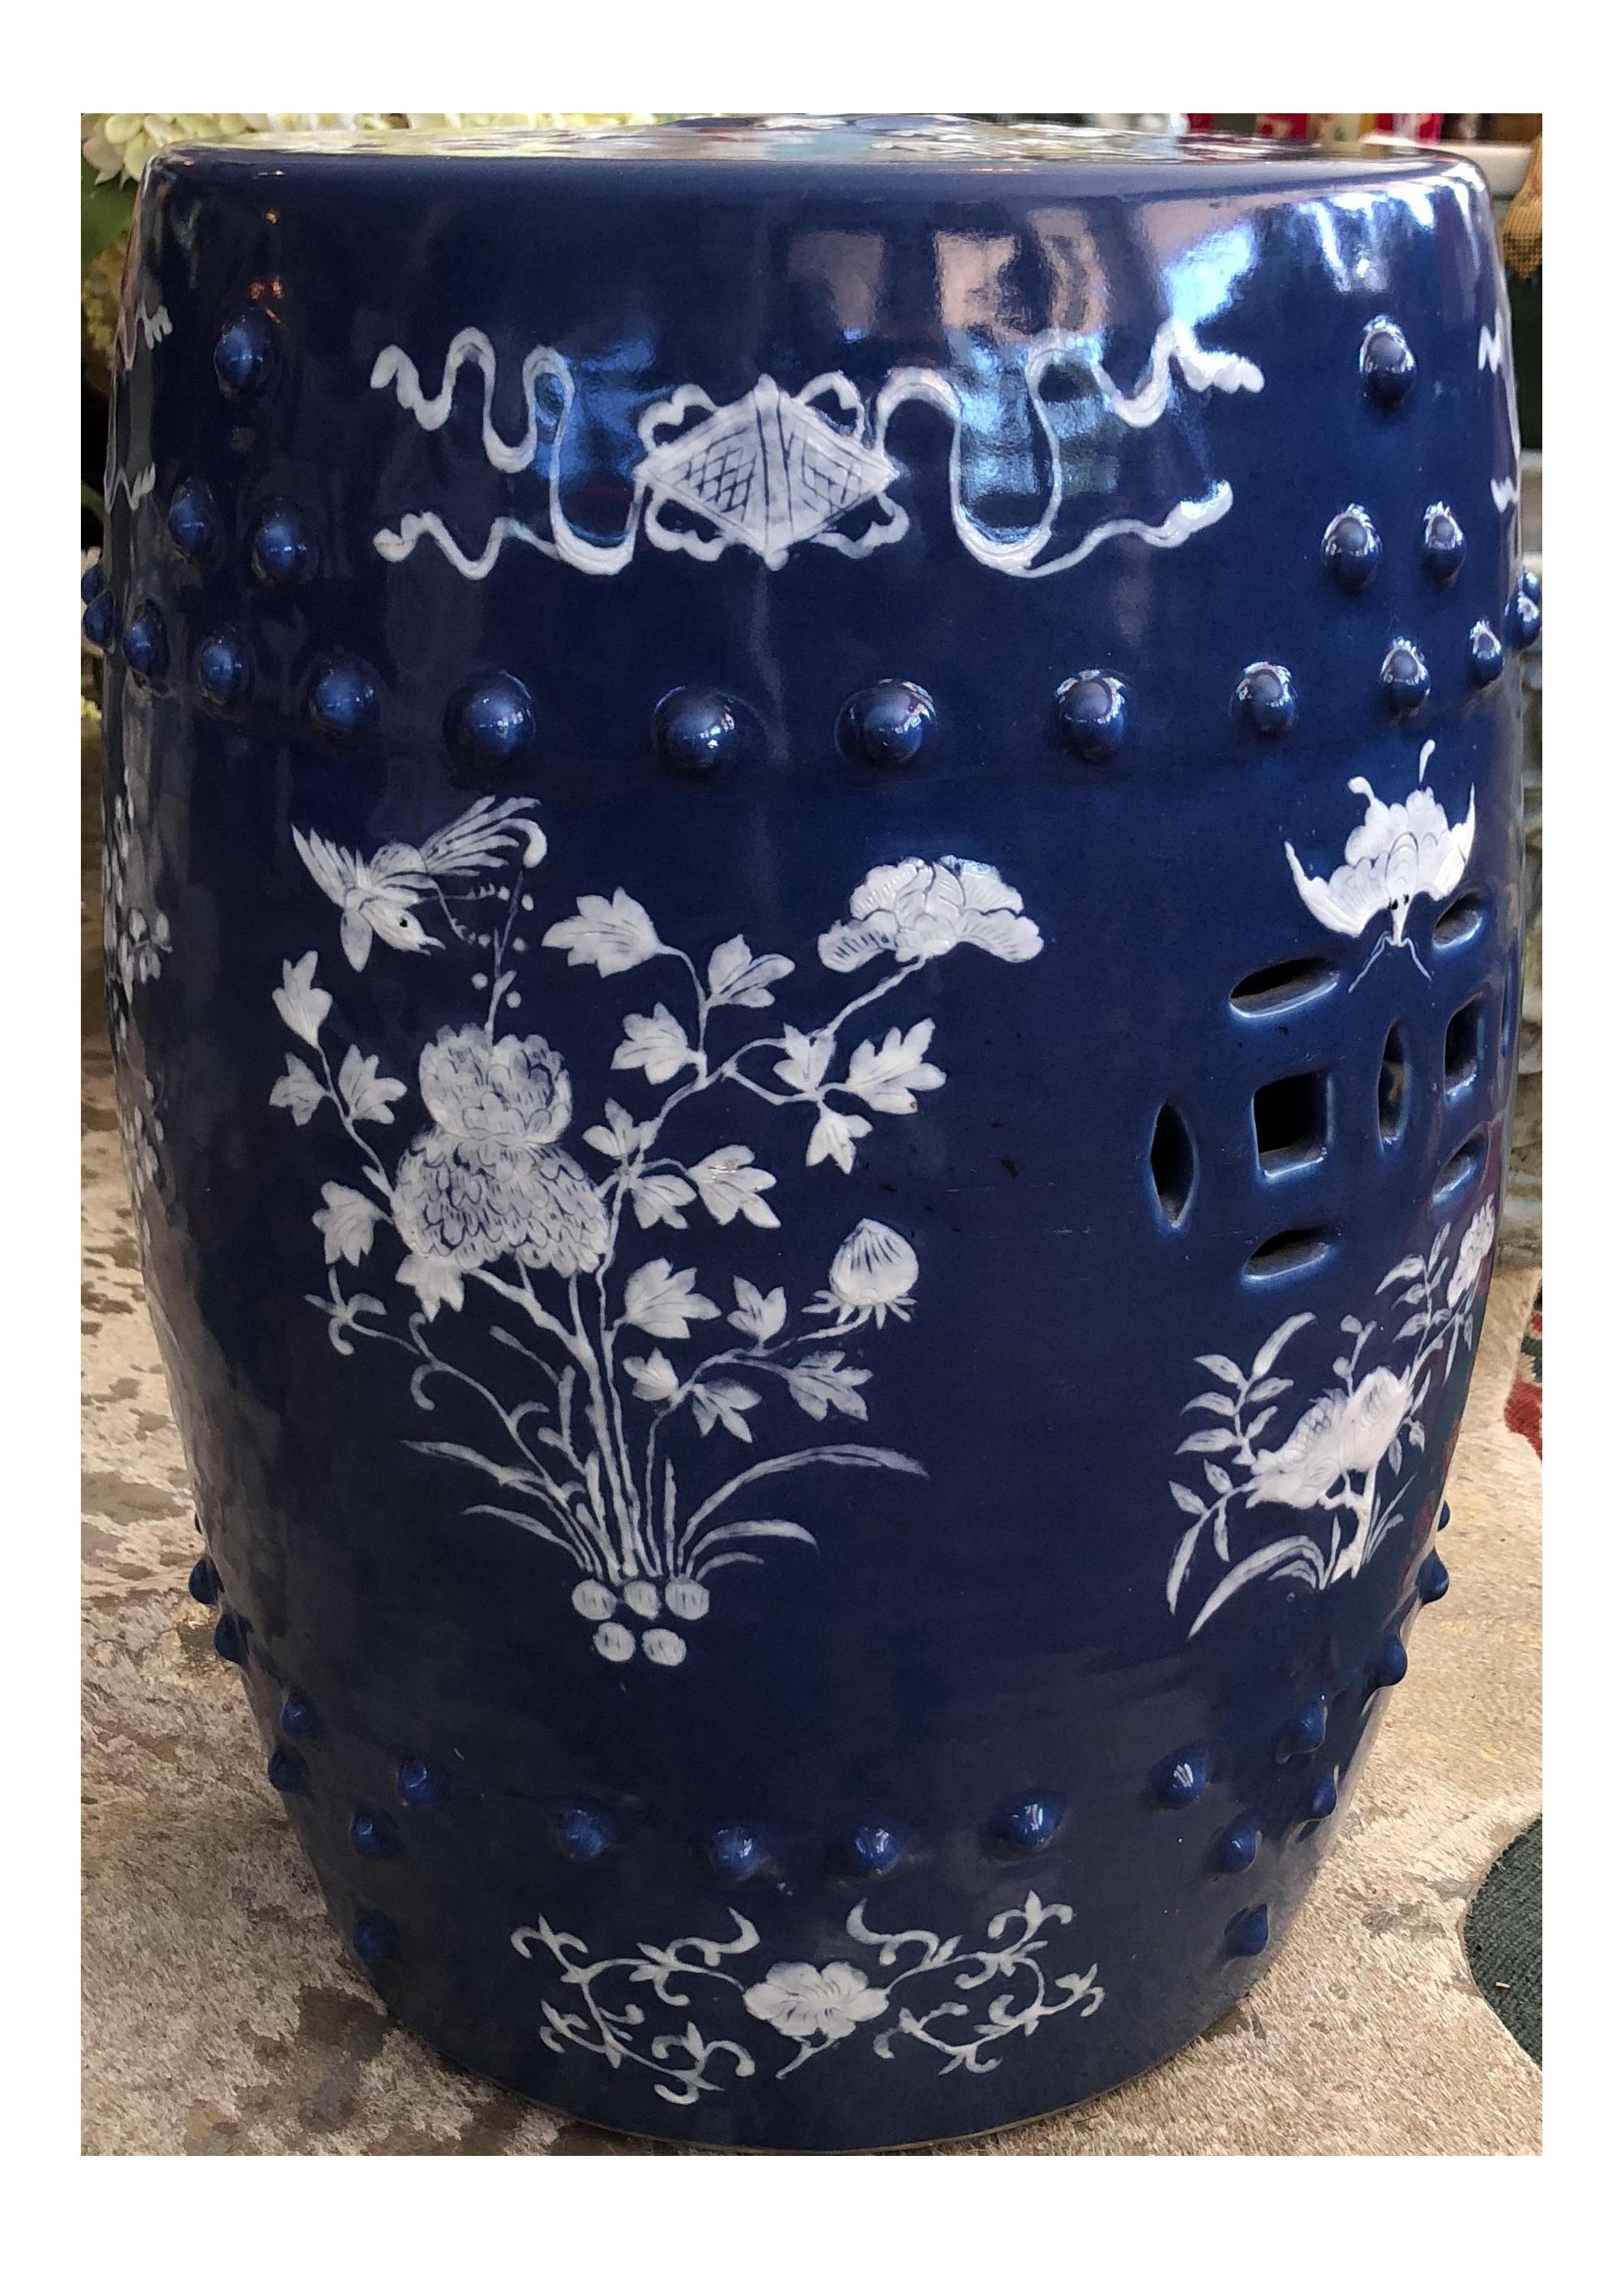 Antique Hand Painted Asian Garden Stool